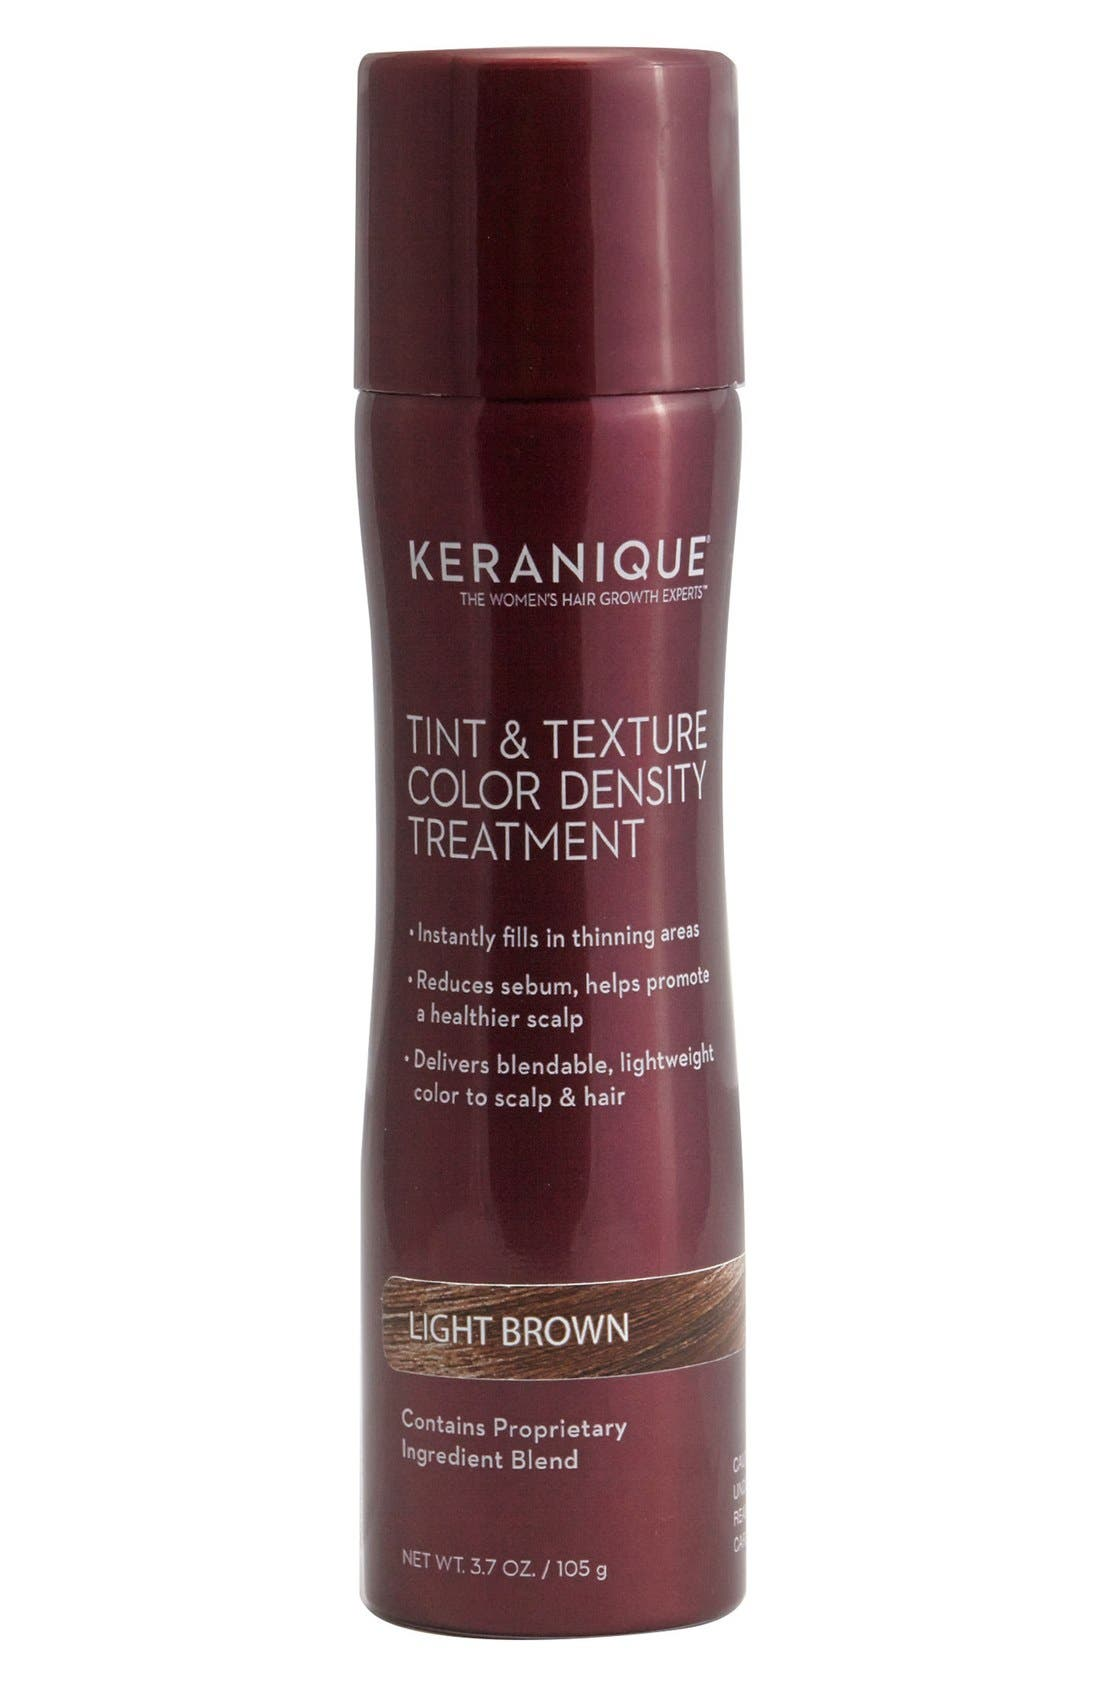 Tint & Texture Color Density Treatment,                             Main thumbnail 1, color,                             LIGHT BROWN